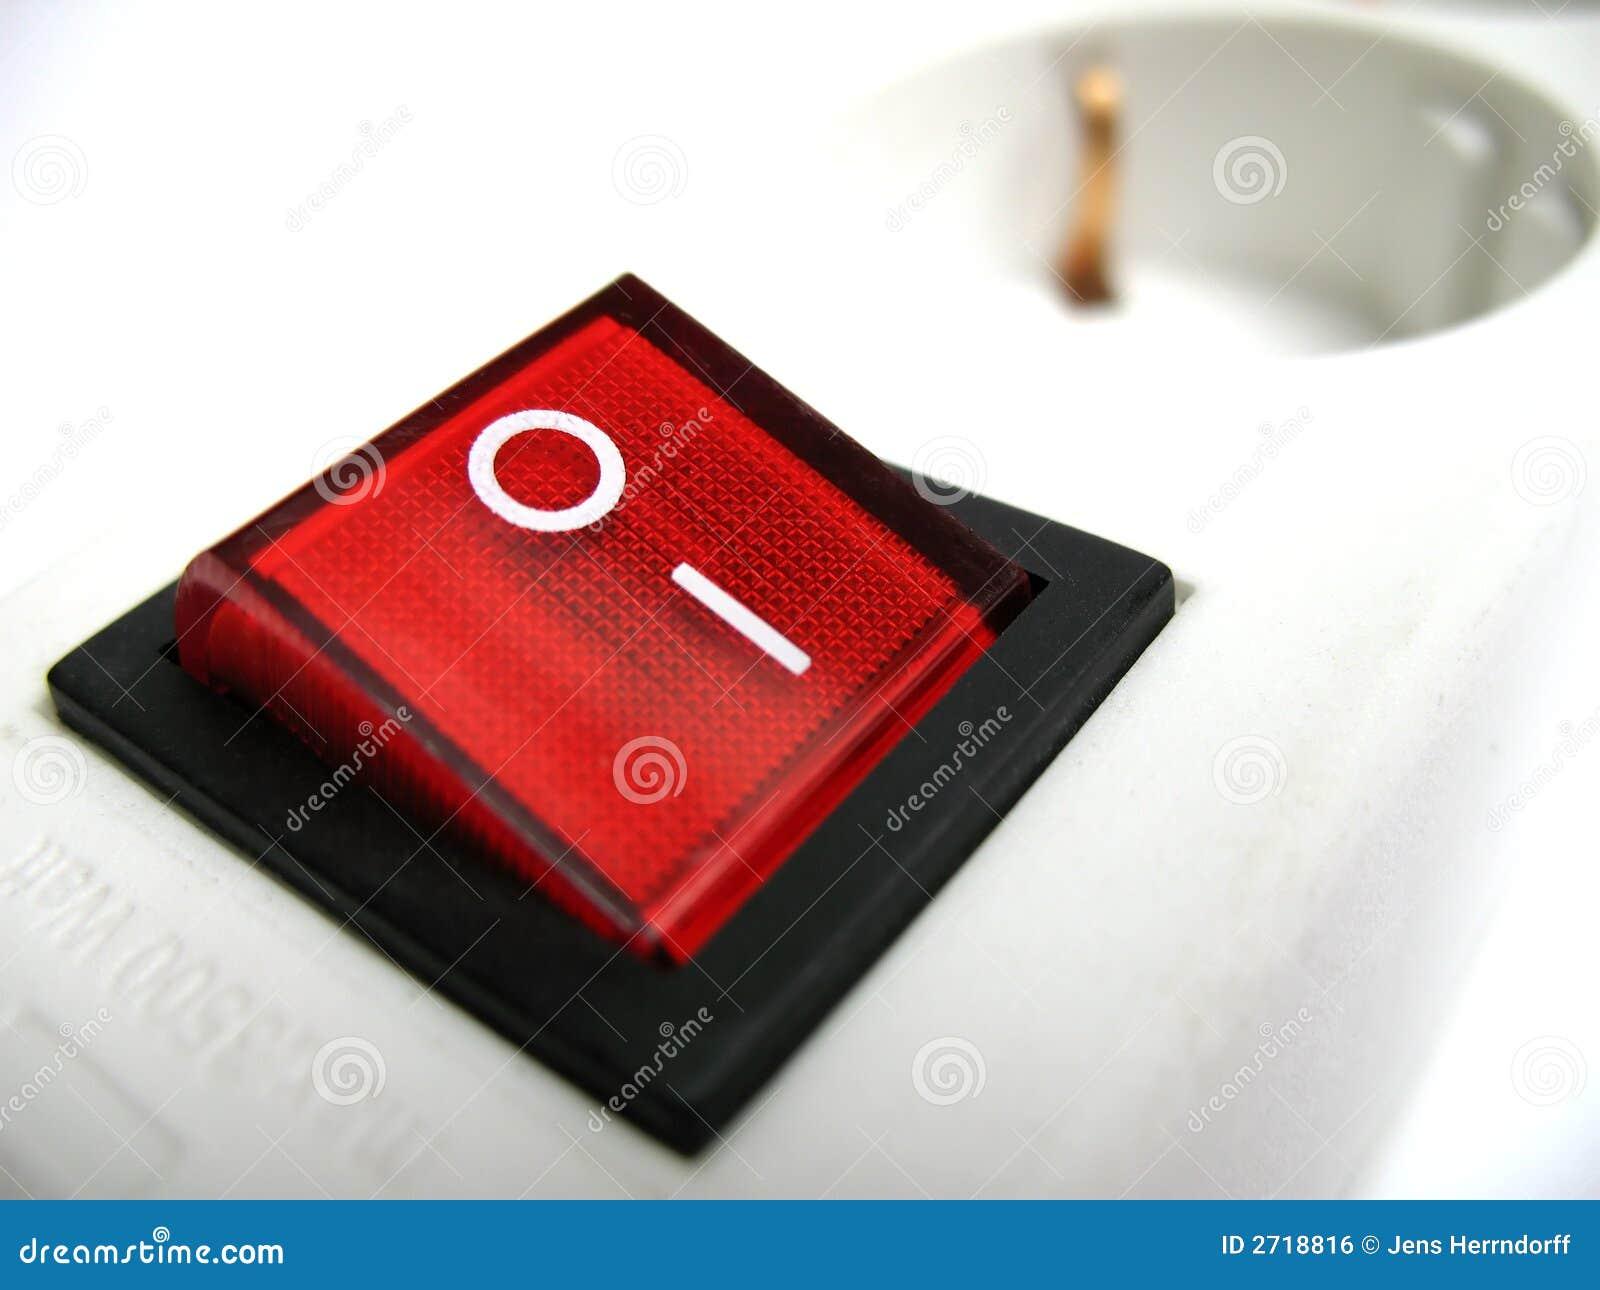 interrupteur rouge image libre de droits image 2718816. Black Bedroom Furniture Sets. Home Design Ideas